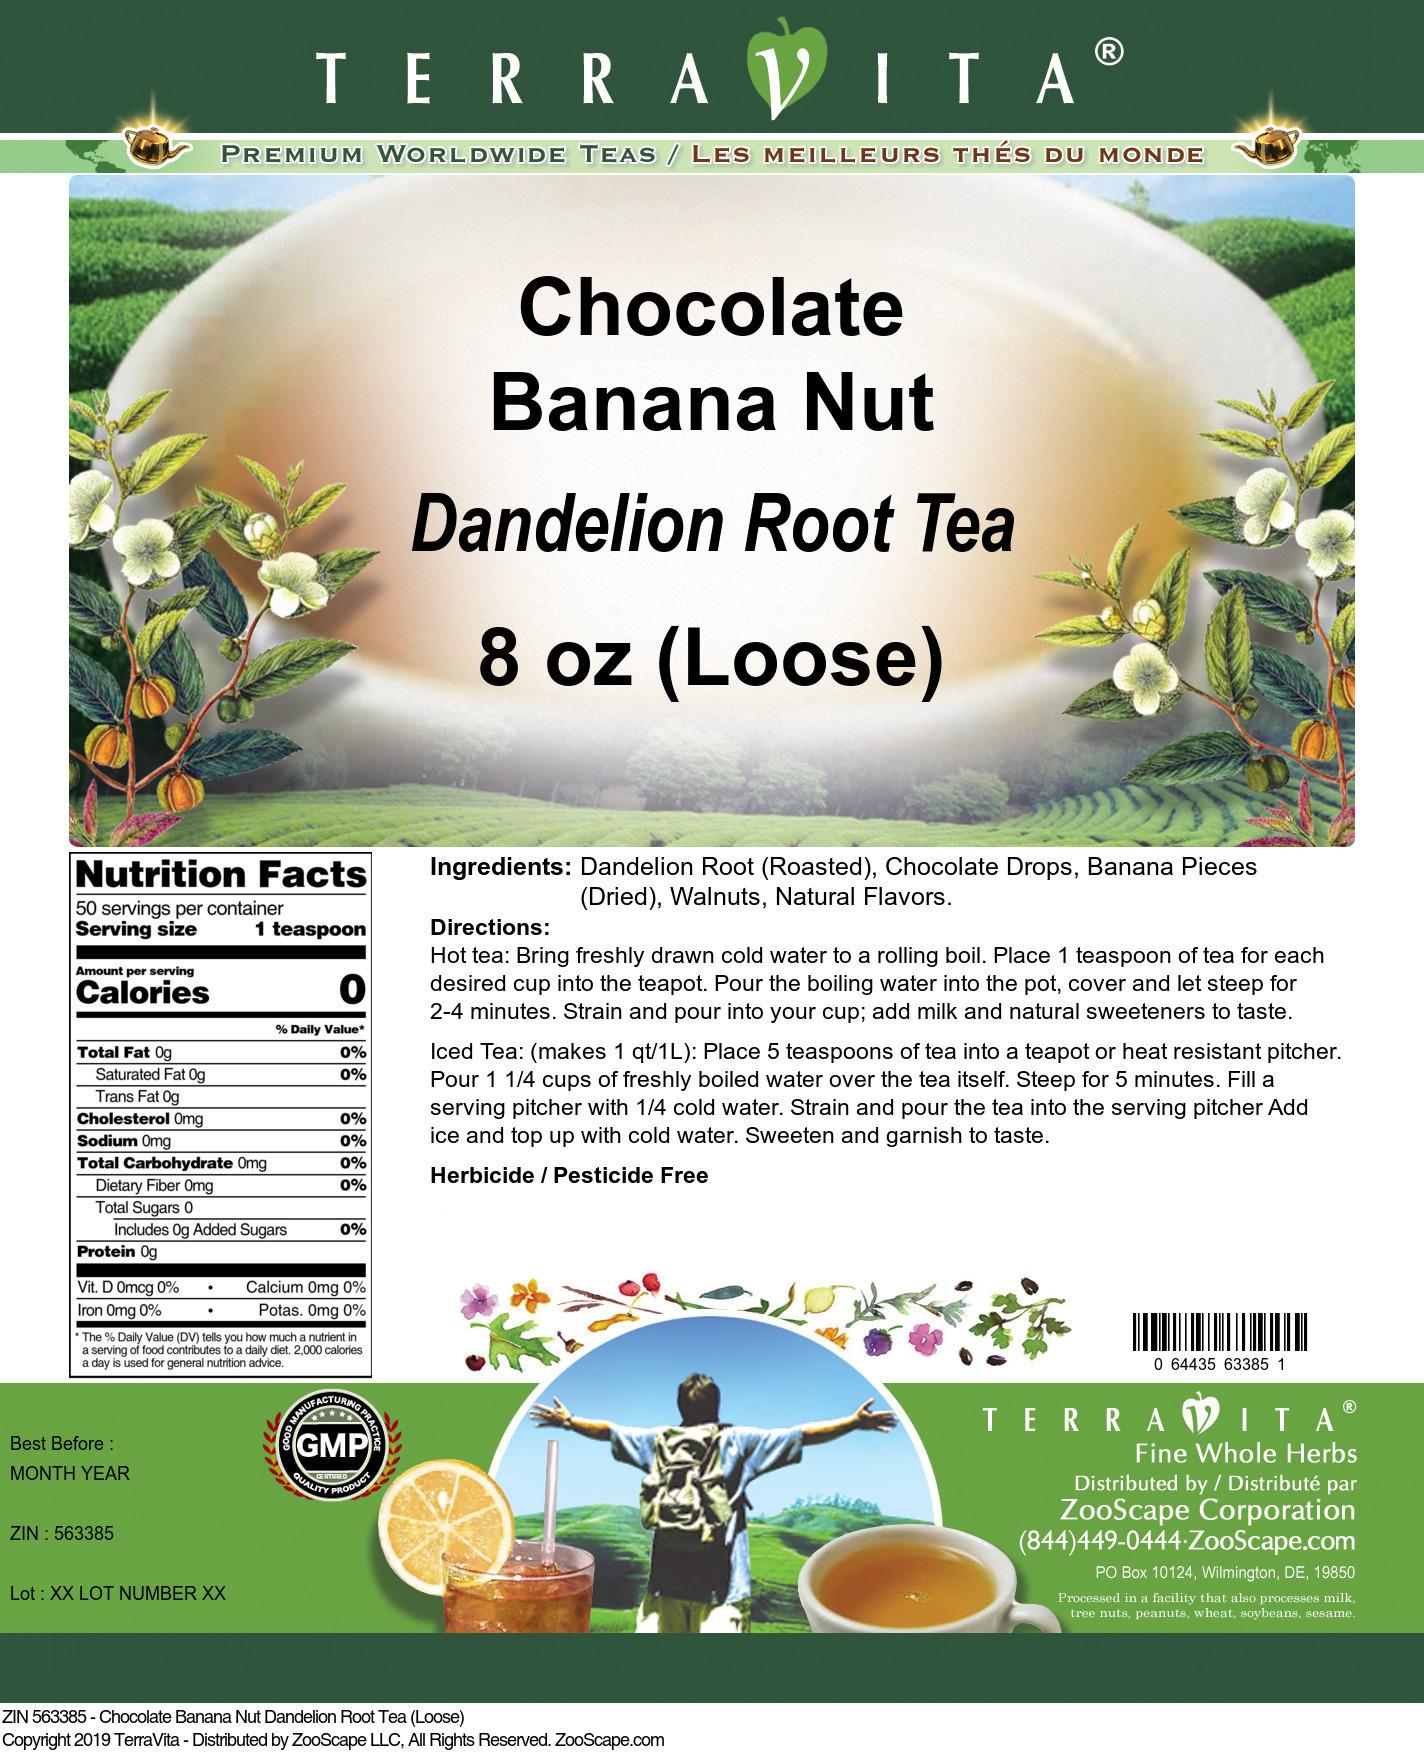 Chocolate Banana Nut Dandelion Root